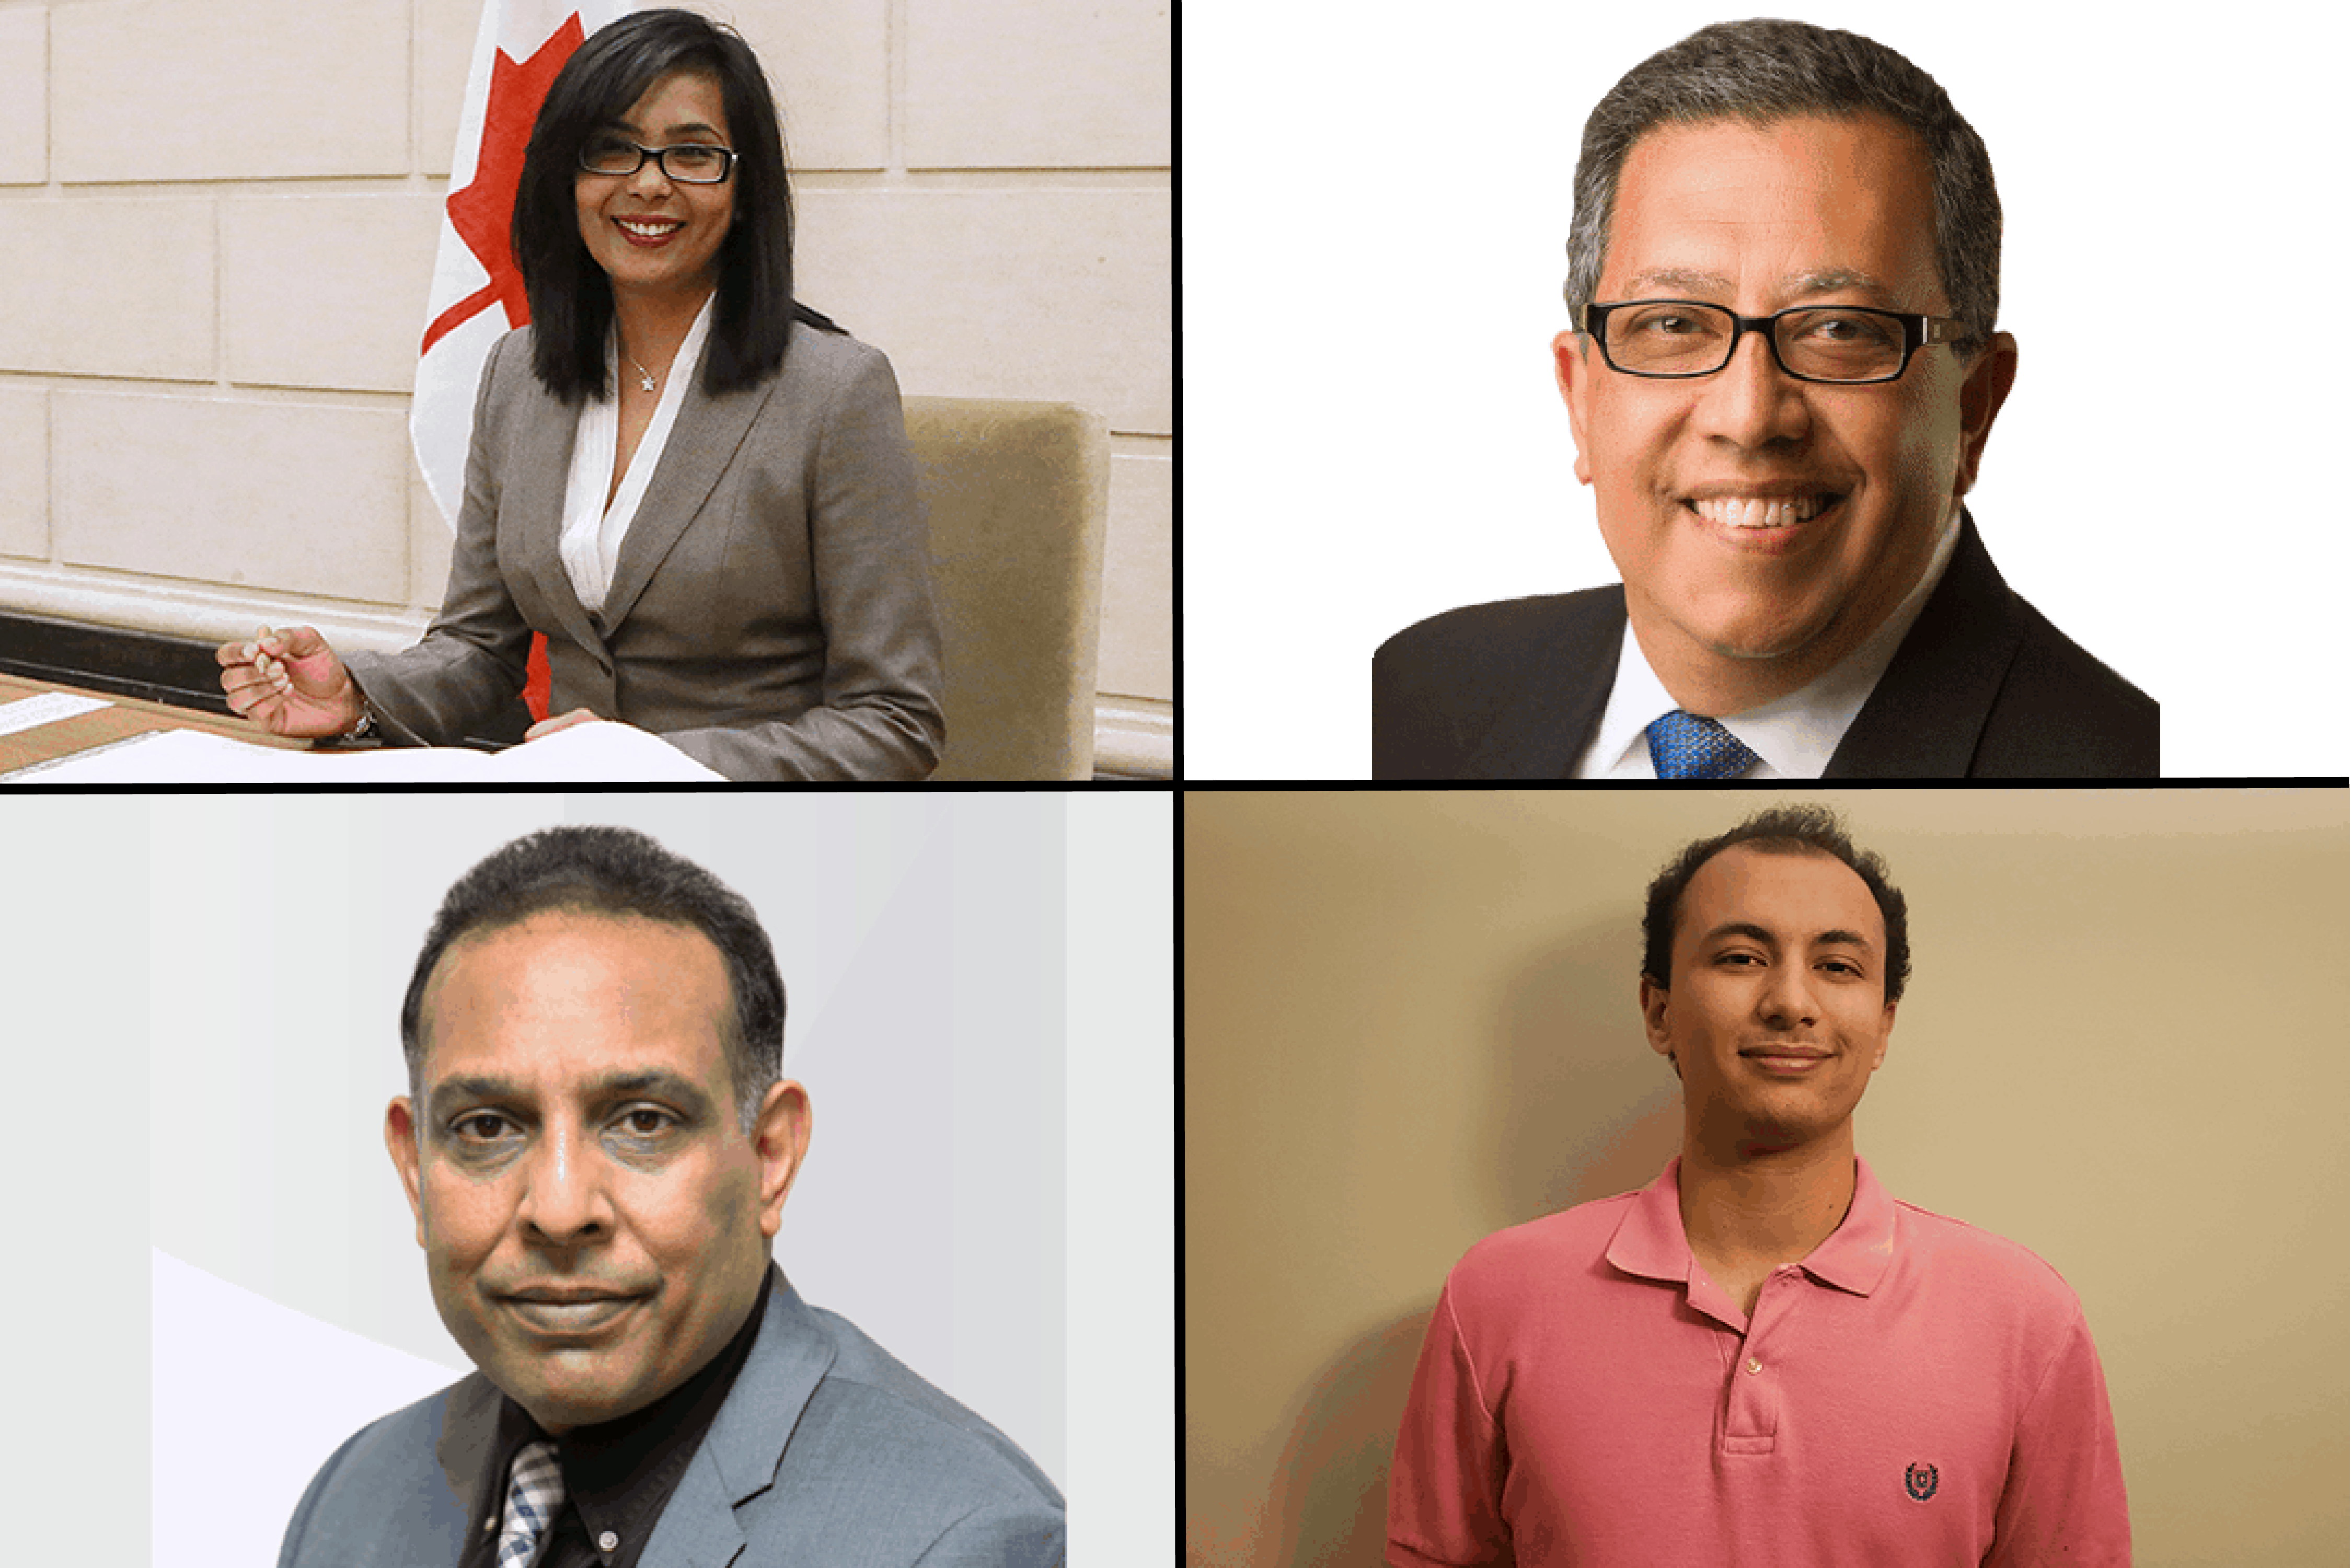 Iqra Khalid, Hani Tawfilis, Salman Tariq, Reno Boscarino-Gaetano. PHOTO COURTESY OF THE CONSERVATIVE PARTY OF CANADA, THE LIBERAL PARTY OF CANADA, THE NEW DEMOCRATIC PARTY,  THE GREEN PARTY OF CANADA | IMAGE HAS BEEN CROPPED